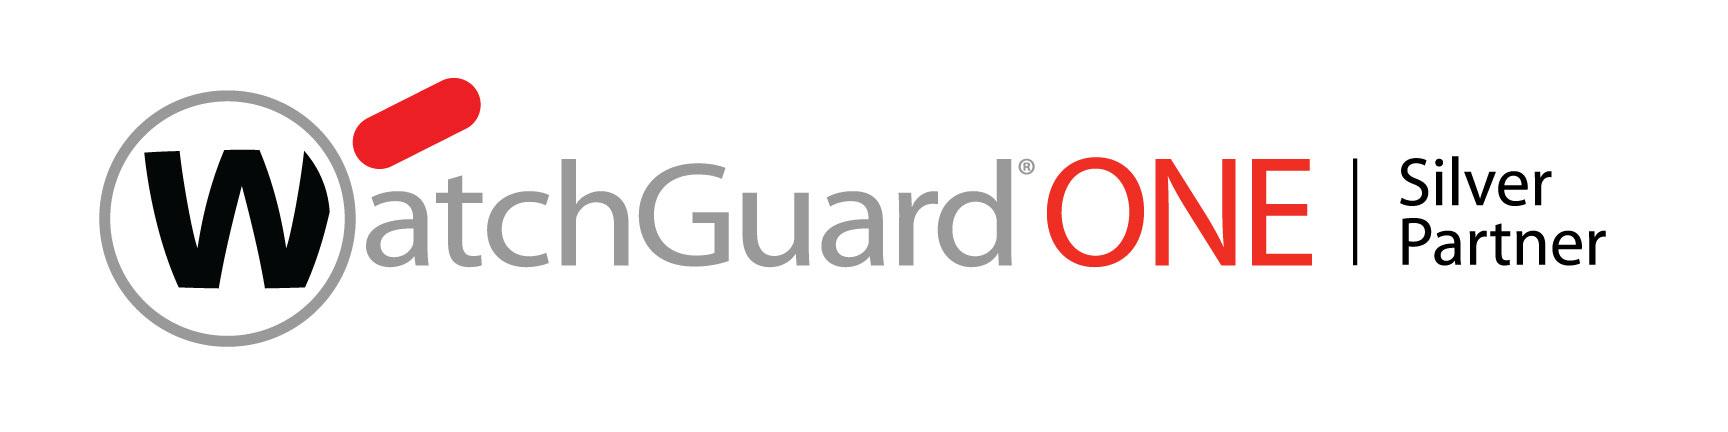 WatchGuardONE Silver Partner